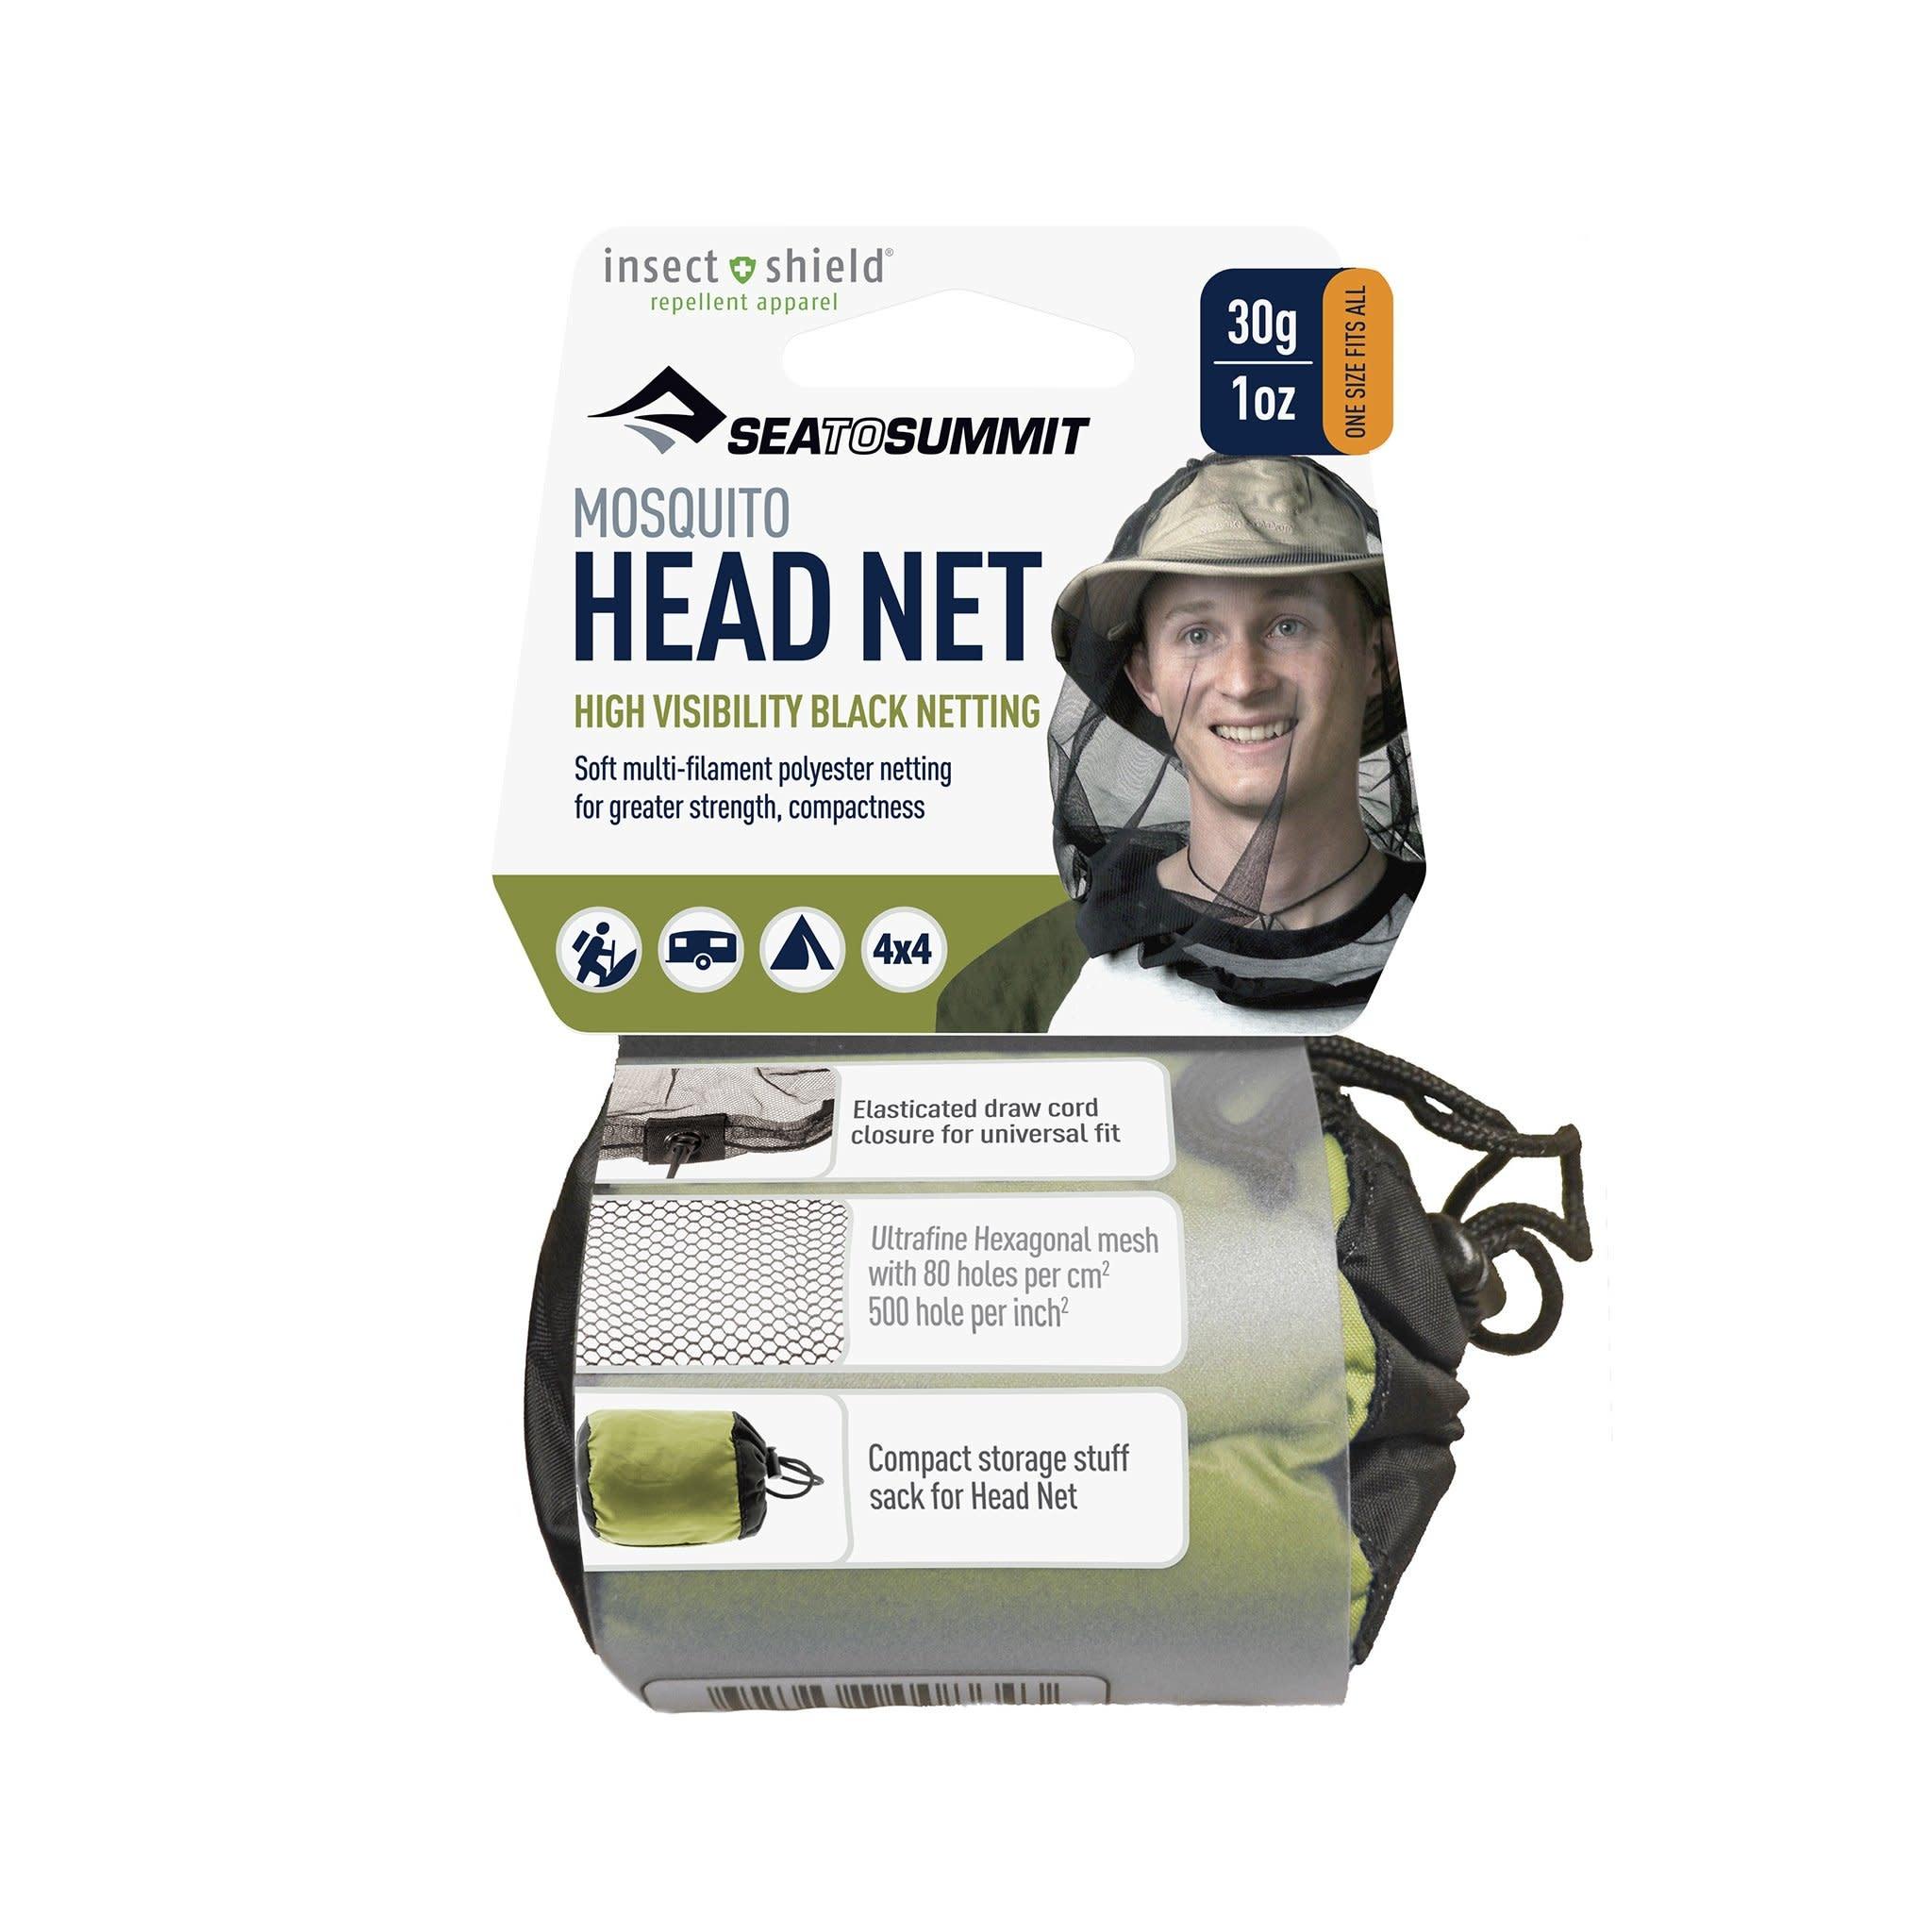 Sea to Summit HEAD NET w/ INSECTSHIELD